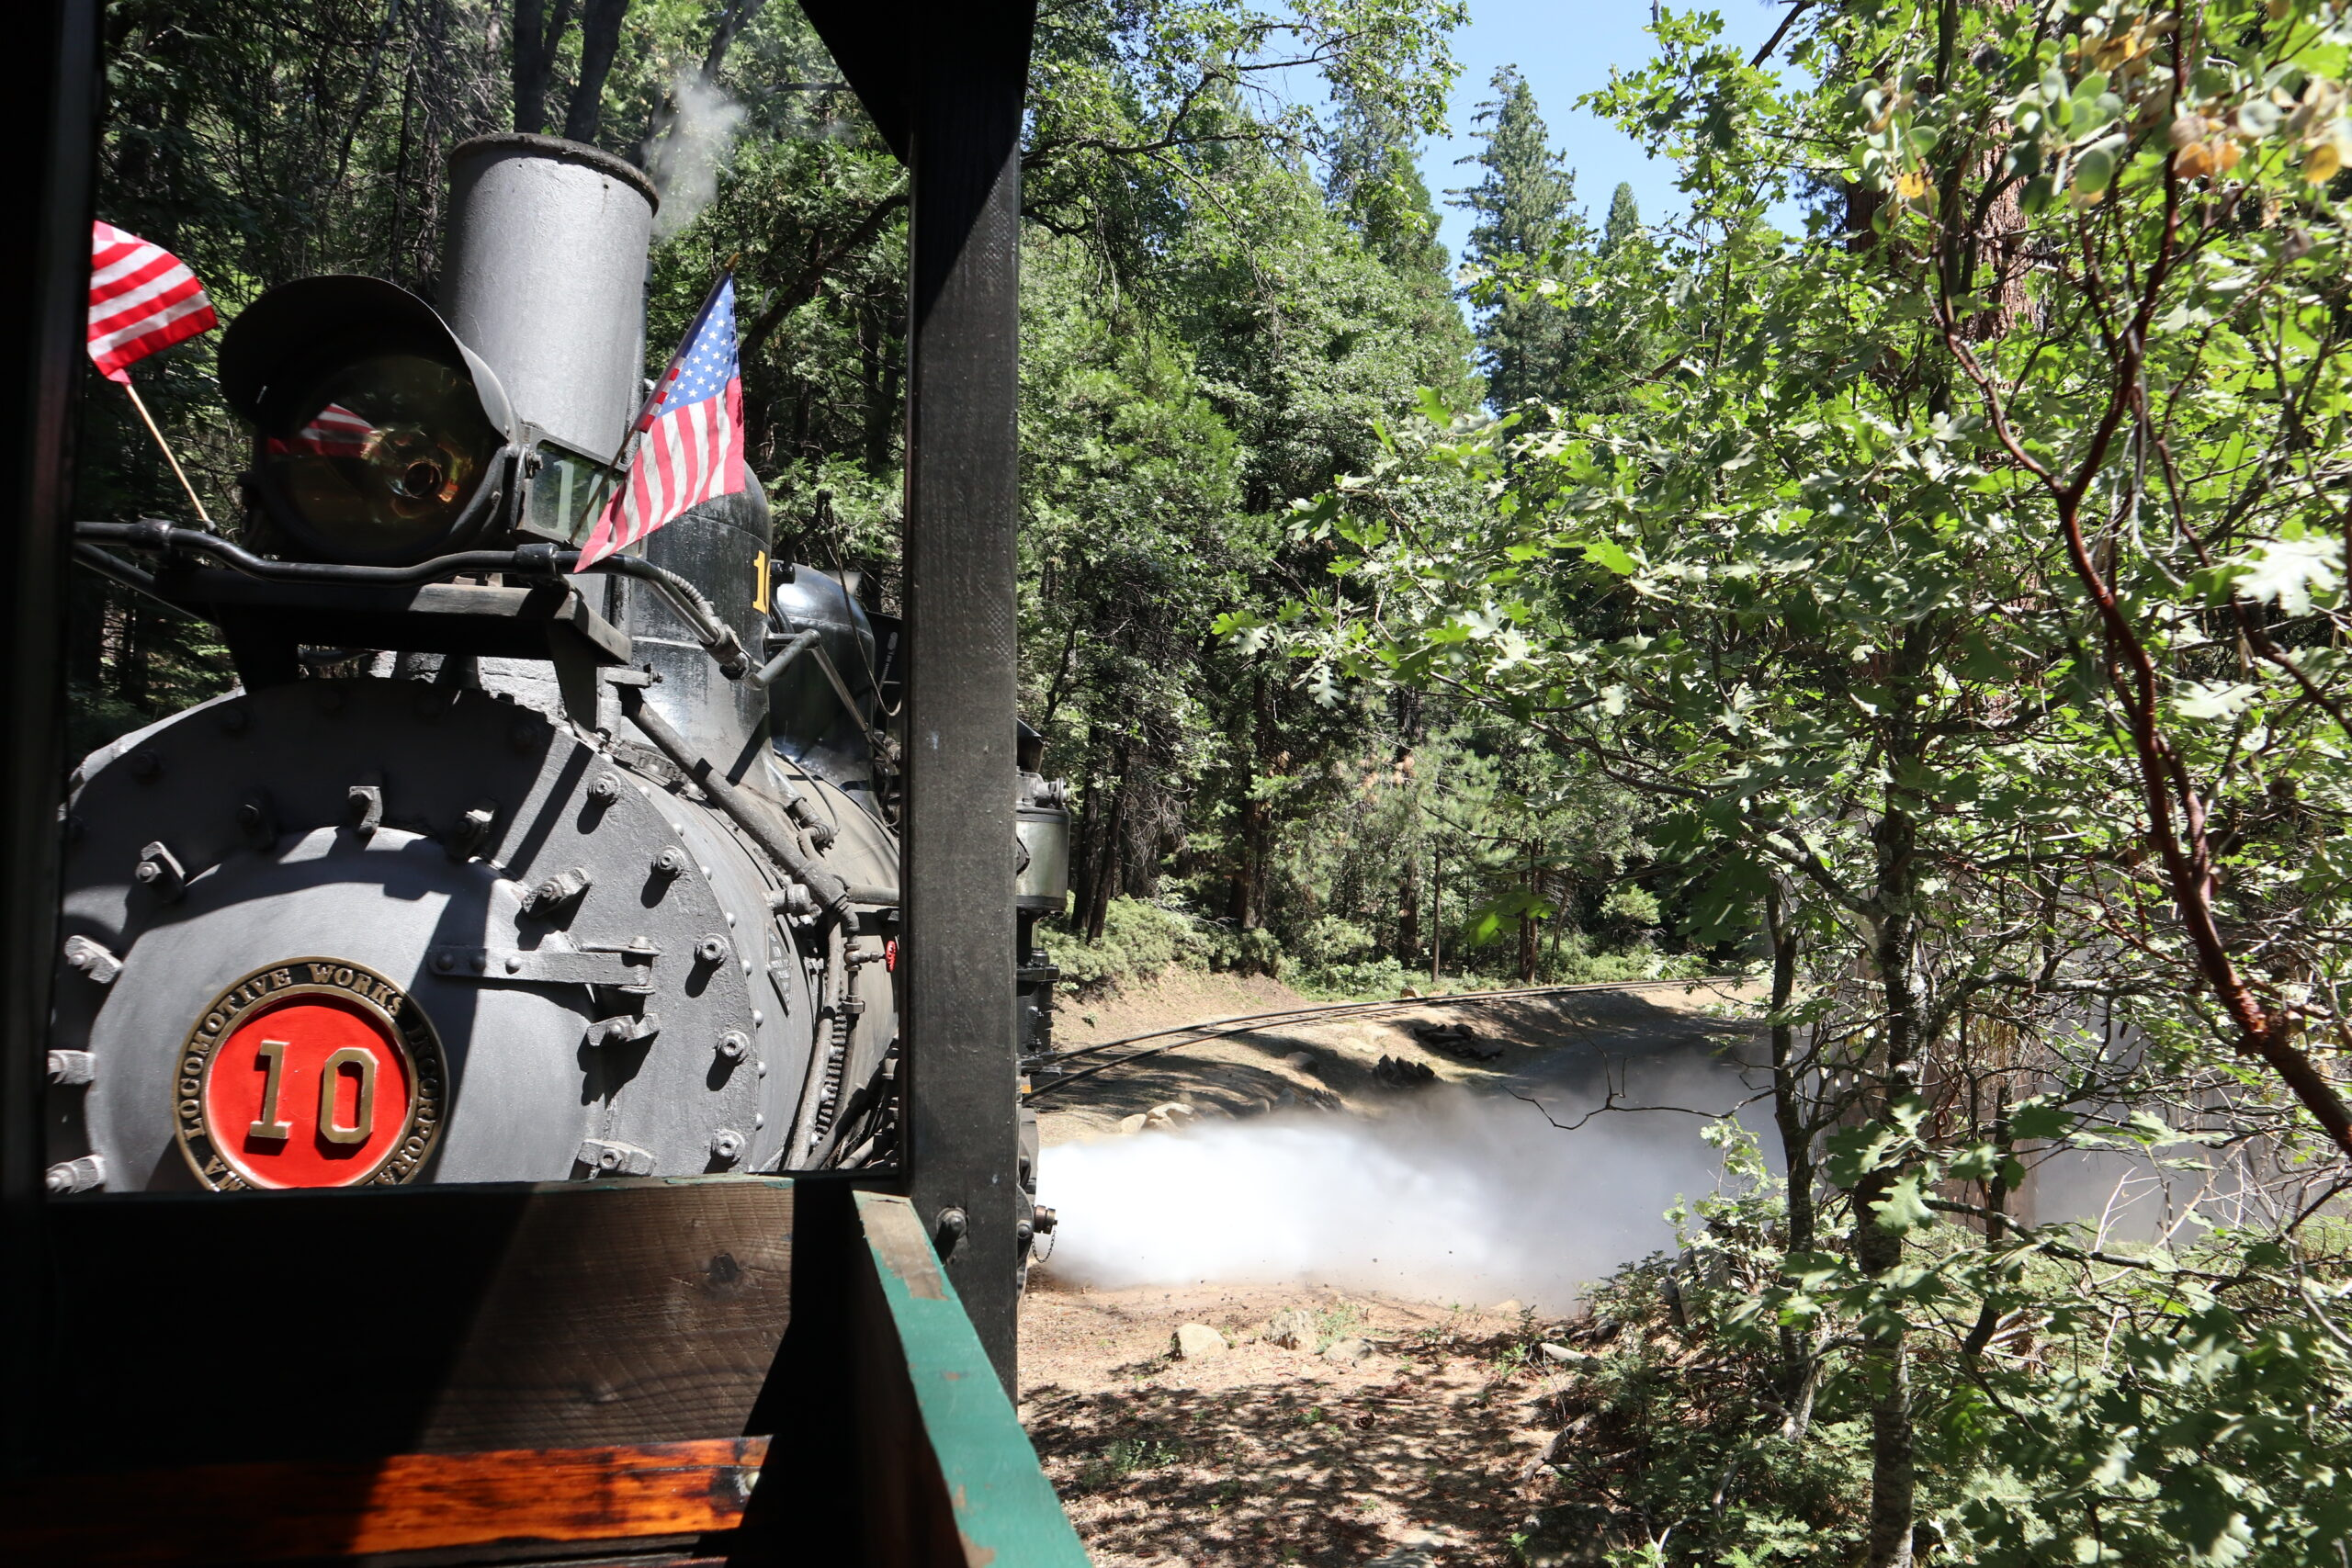 Yosemite Mountain Sugar Pine Railroad vintage steam train ride through the forest